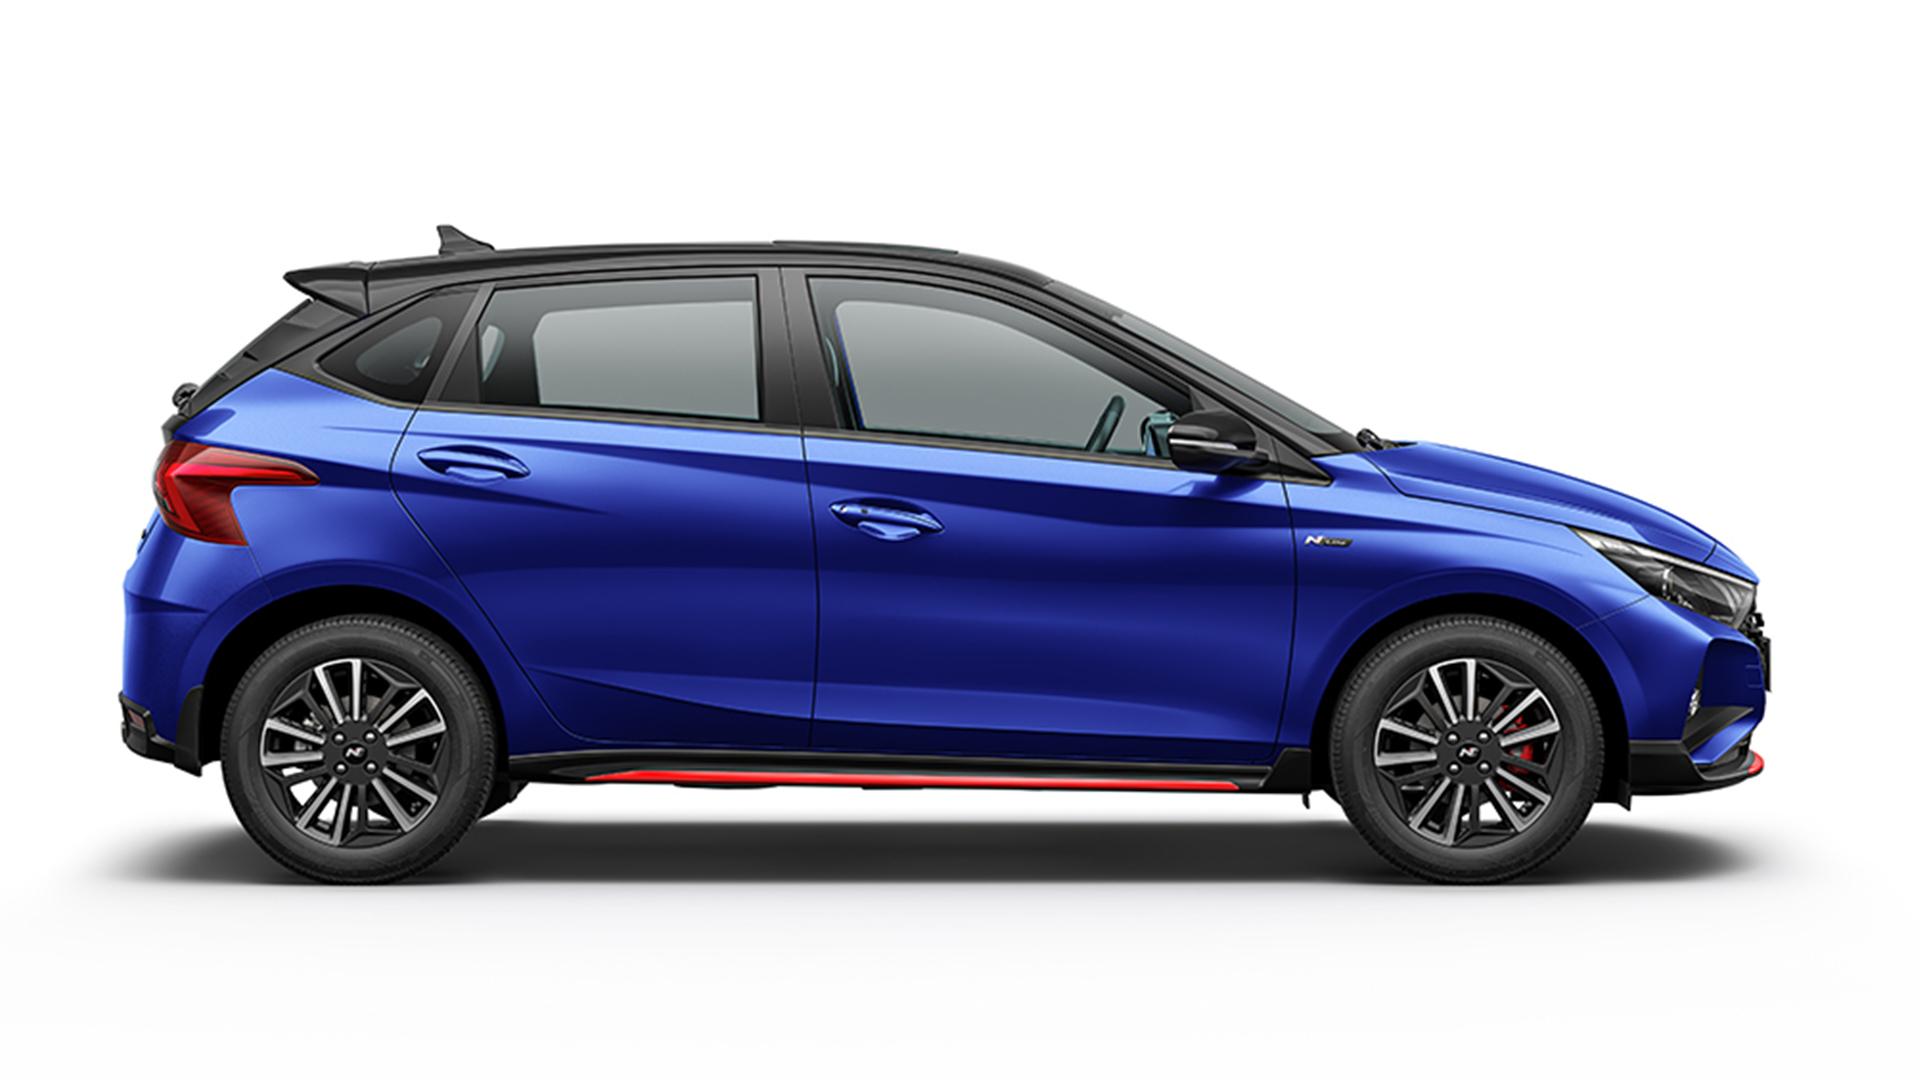 Hyundai i20 N-Line 2021 N8 Exterior